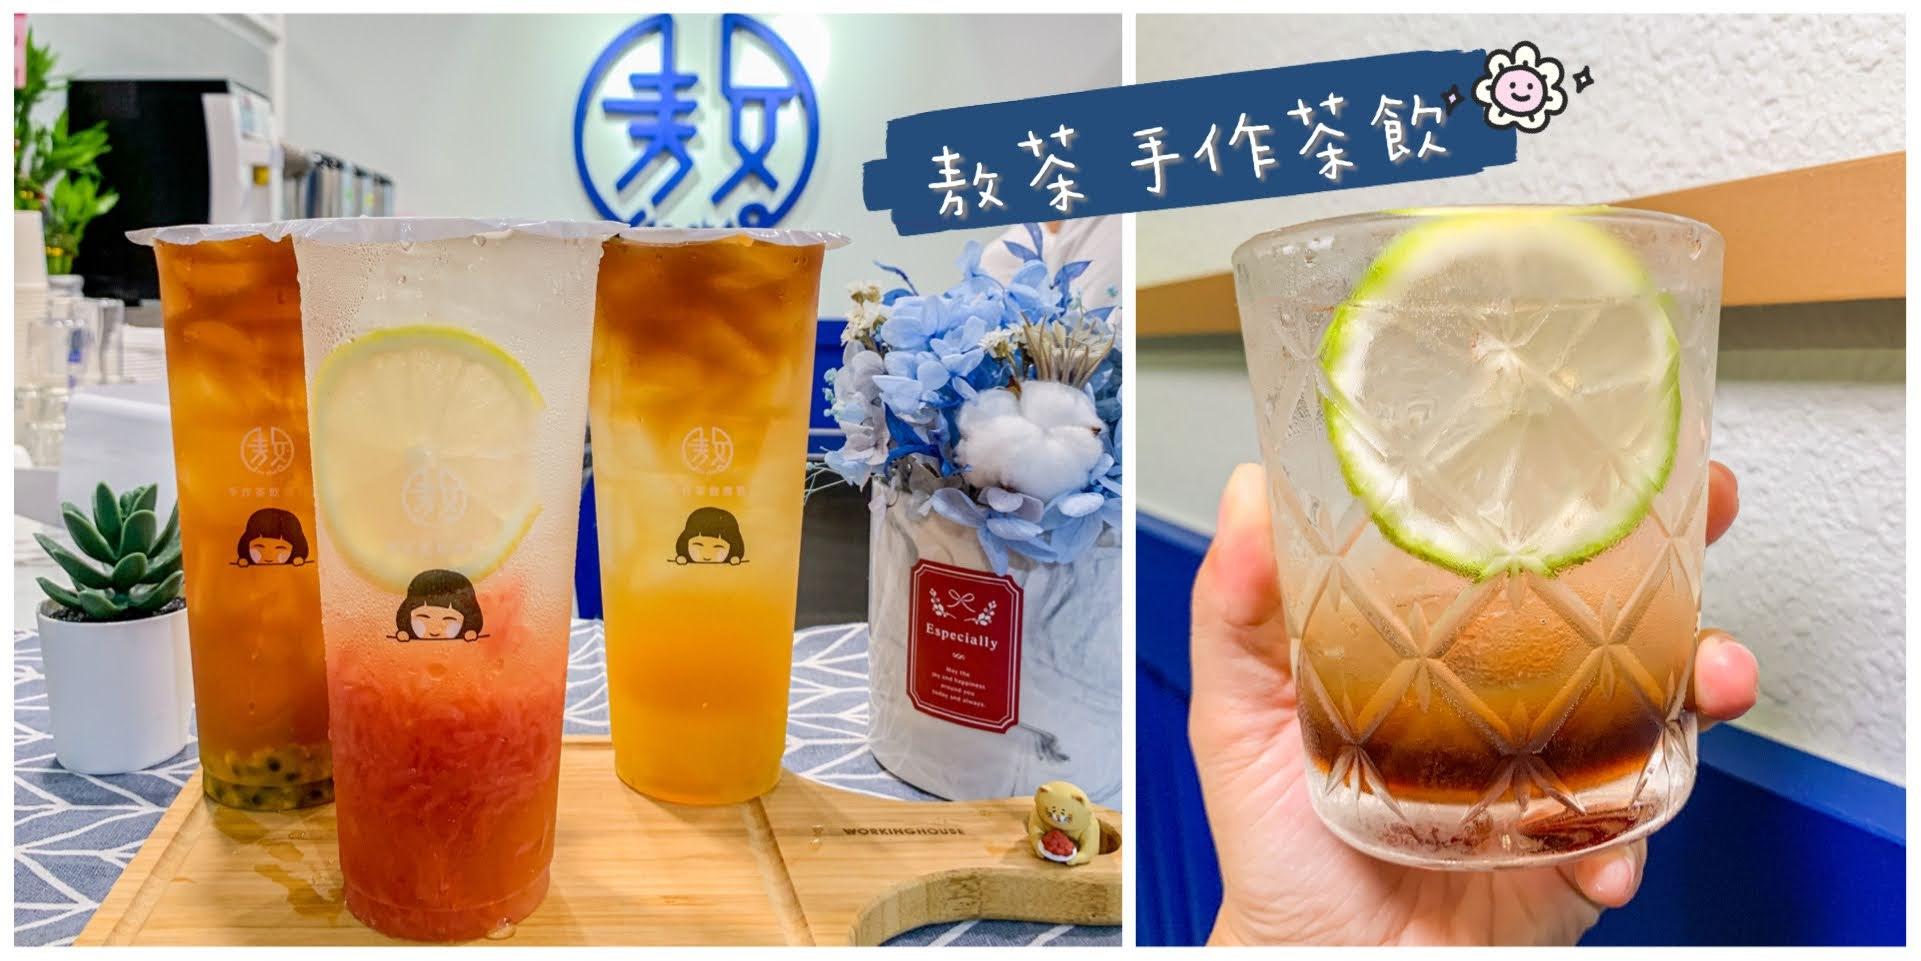 IMG_7542-[台南][安平]敖茶手作茶飲|烏梅汁x咖啡,梅想到的新組合!|真材實料天然好茶安平必喝飲料